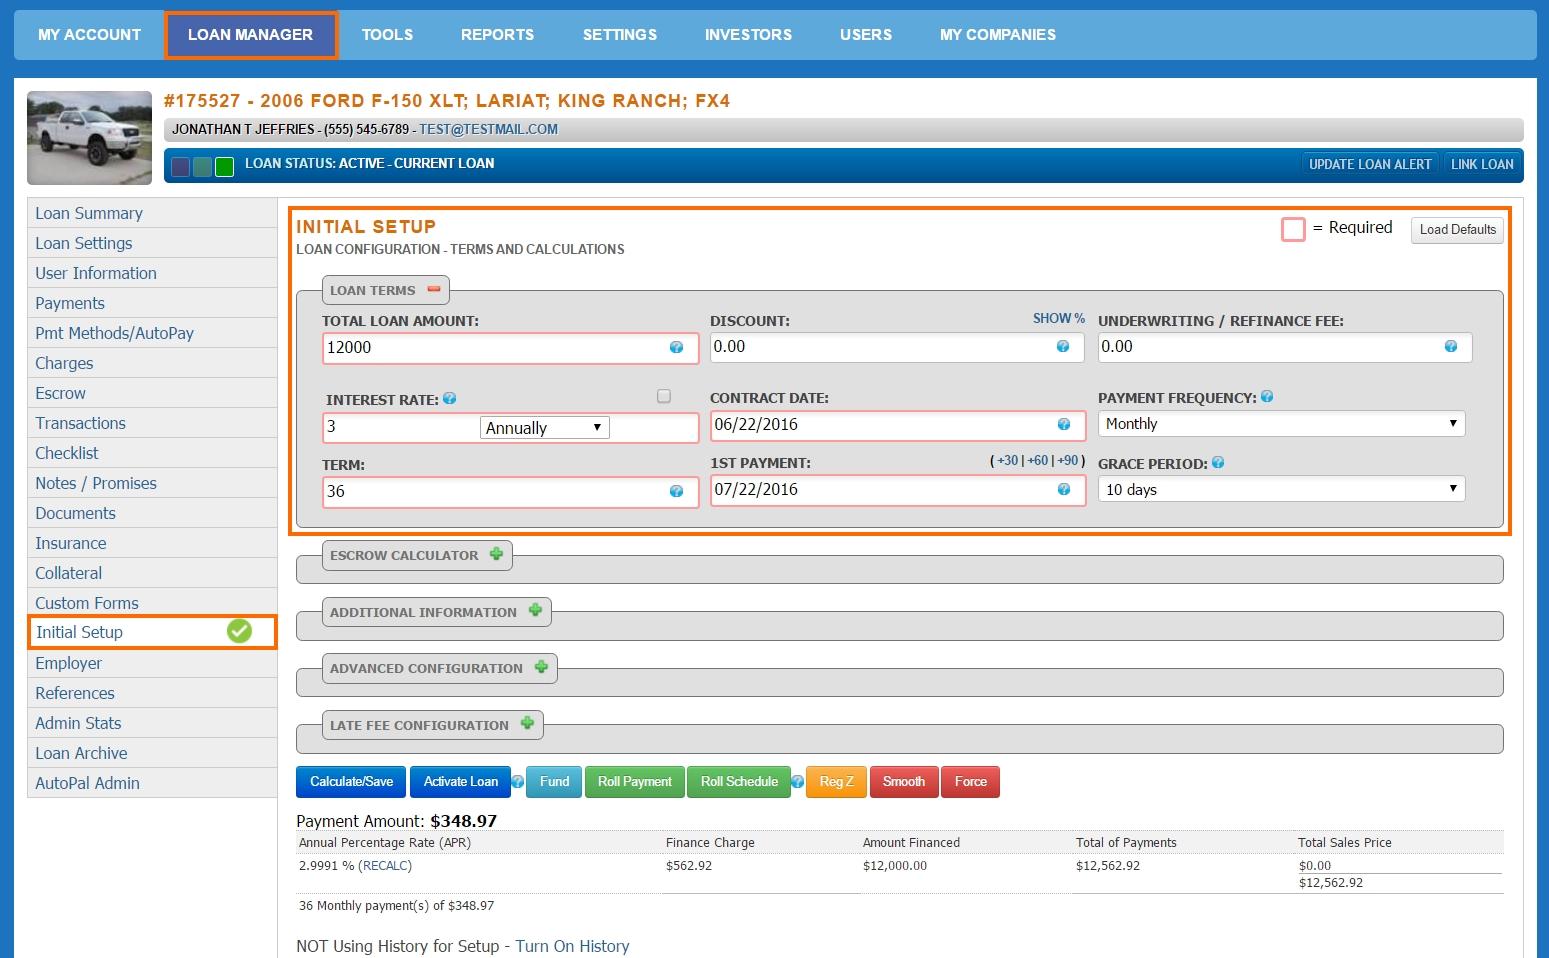 Loan Manager - Initial Setup - Loan Terms2